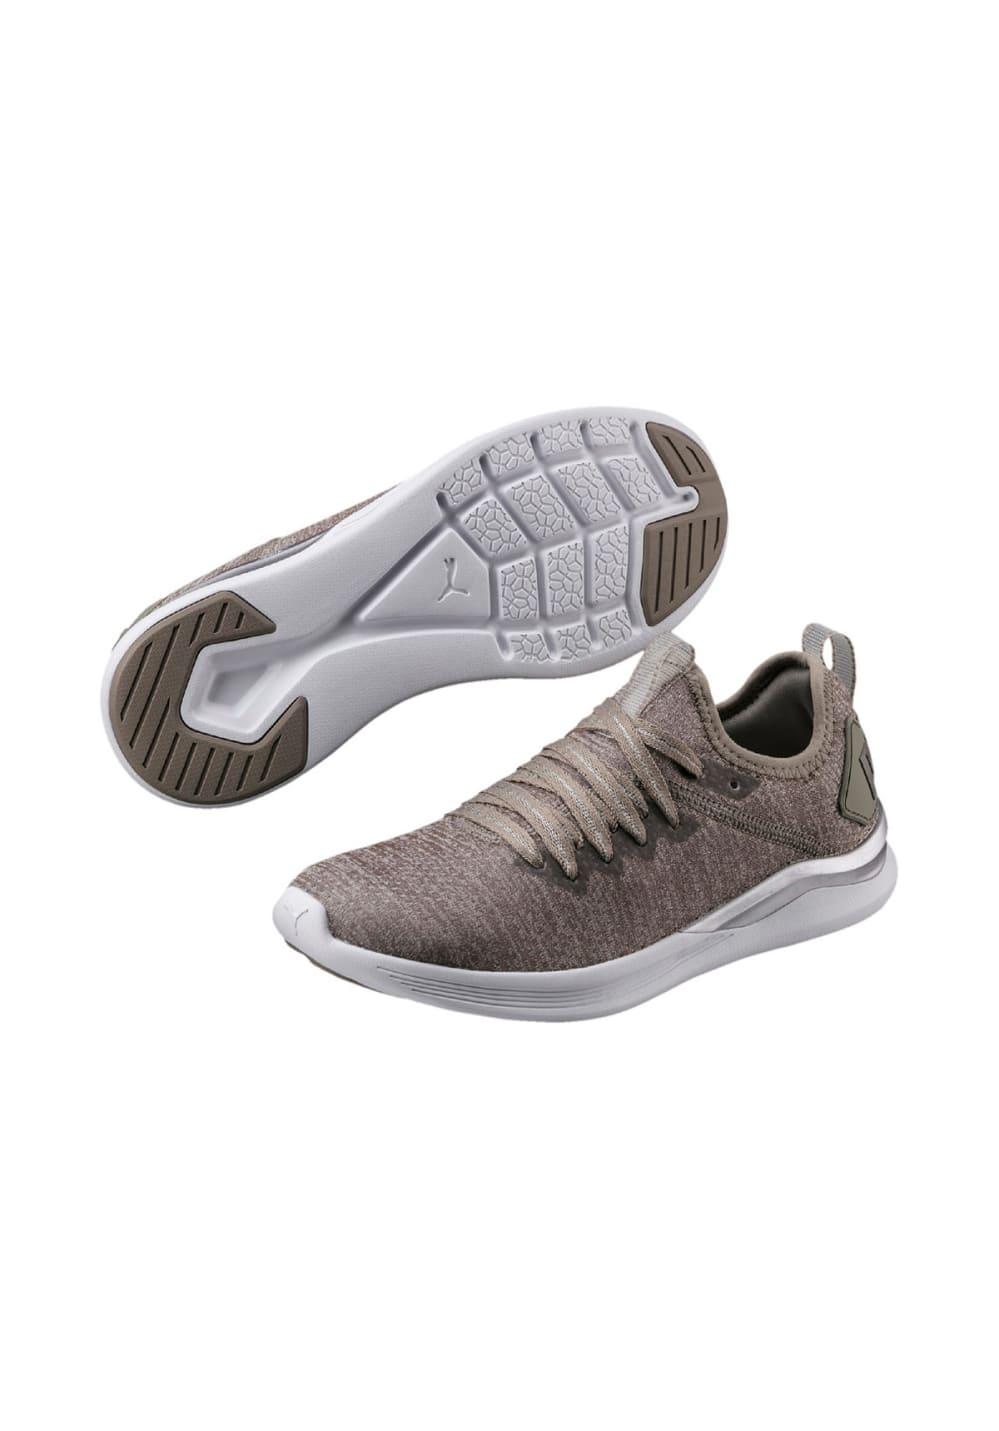 promo code cedeb c716c Puma IGNITE Flash evoKNIT EP - Running shoes for Women - Brown